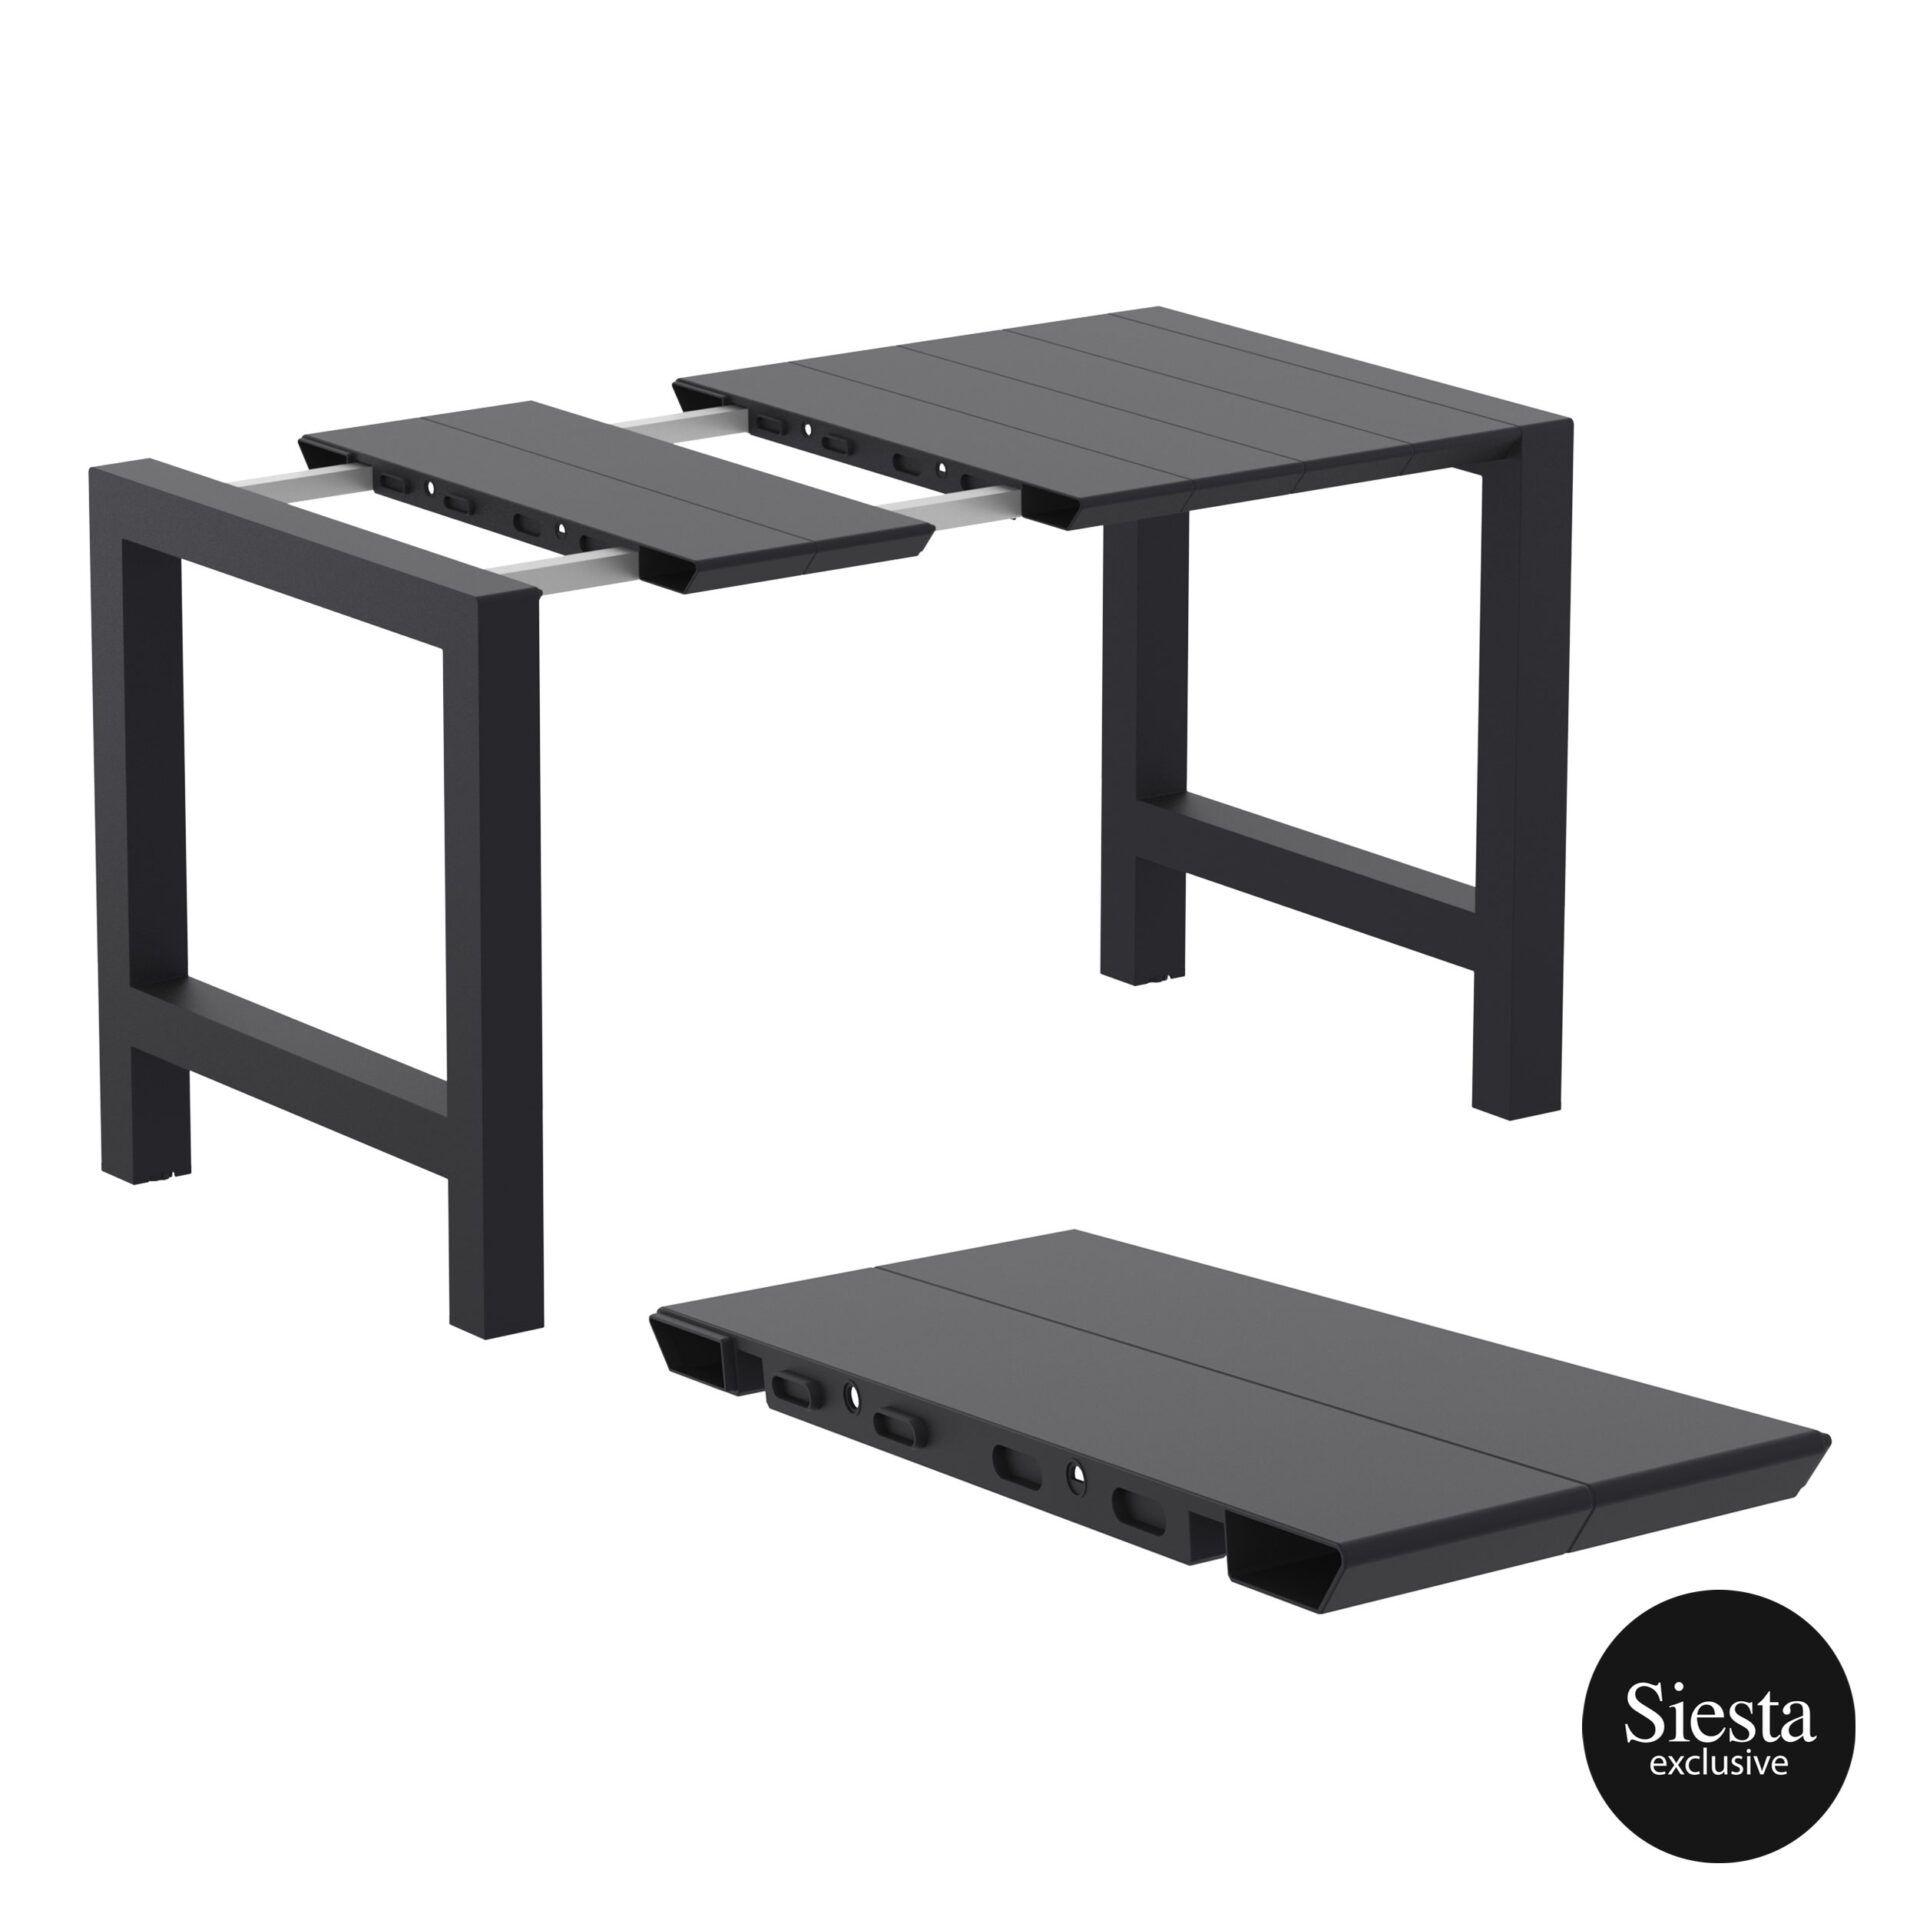 001 vegas bar table 140 black extension part